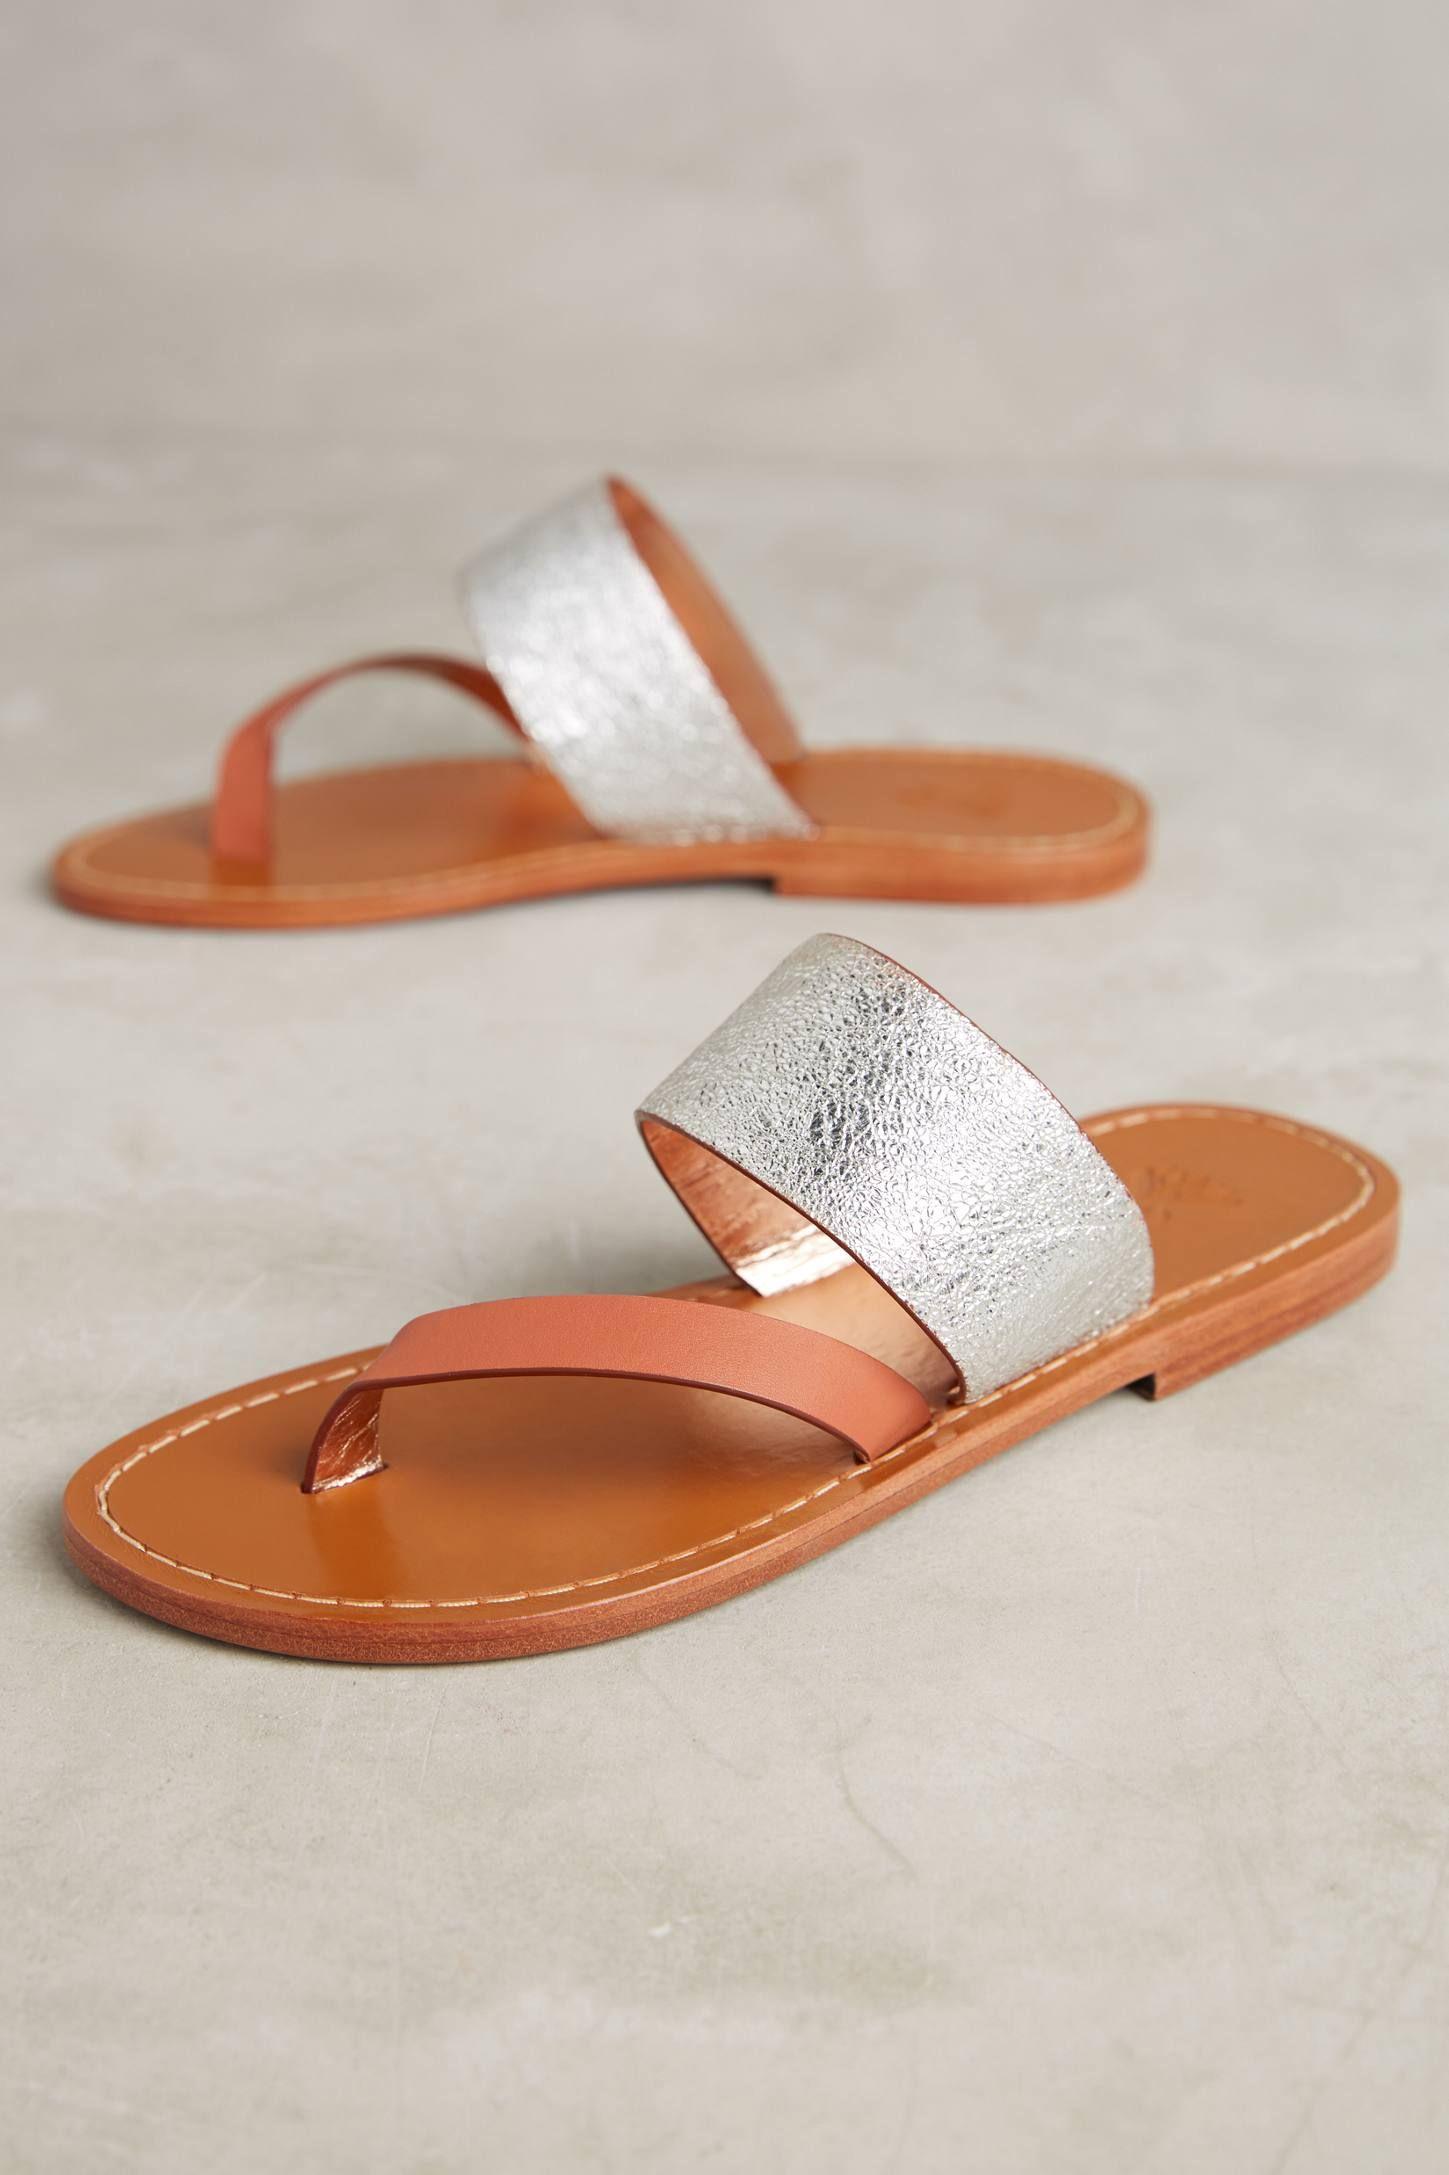 2981213e5916 Slide View  1  Sanchita Berberis Metallic Sandals